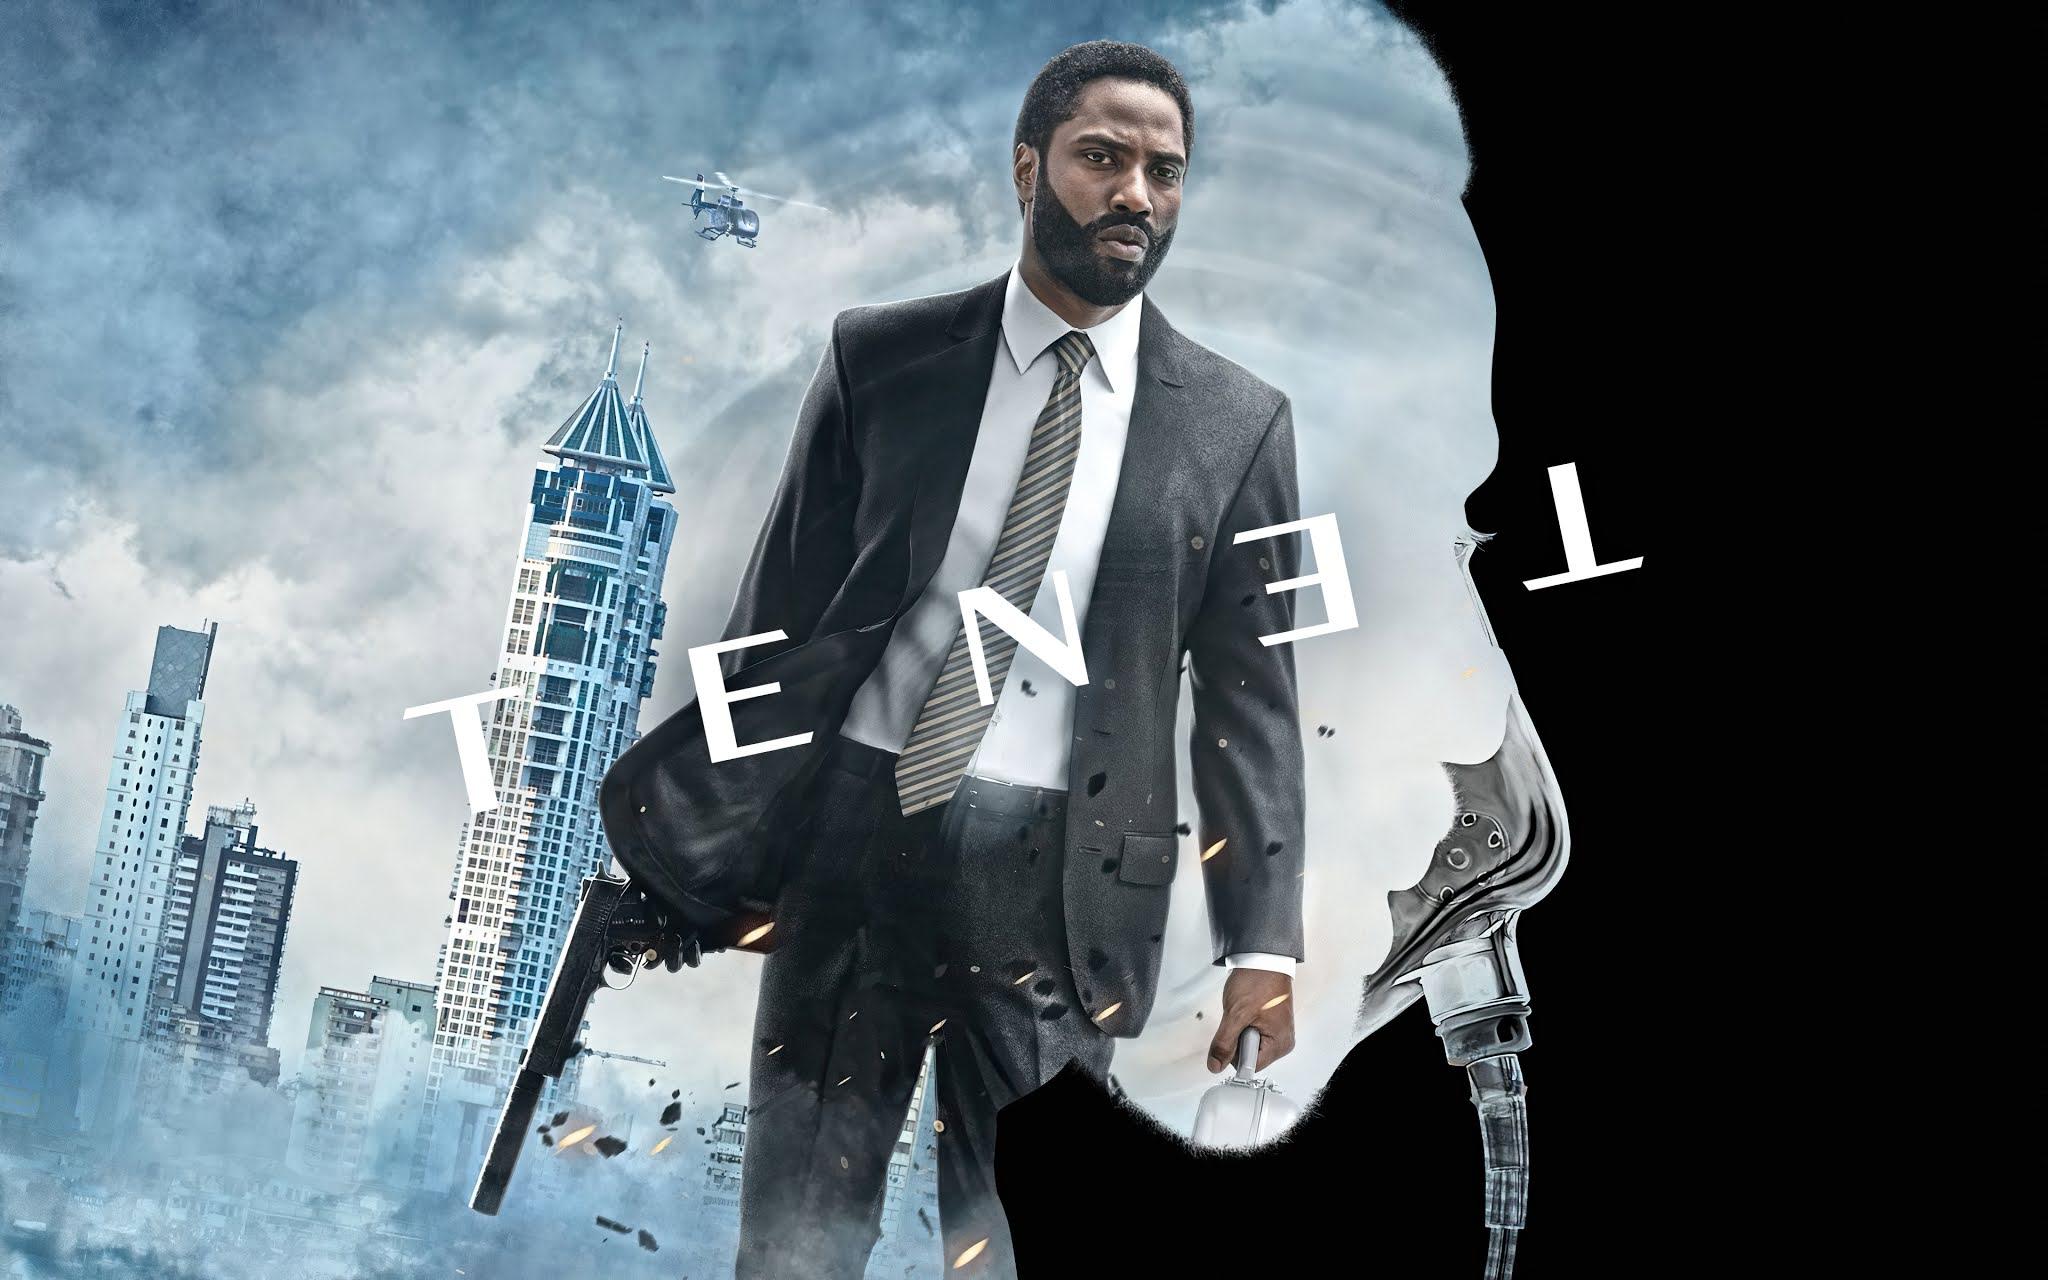 Download Tenet 2020 Full Movie Hd Dual Audio